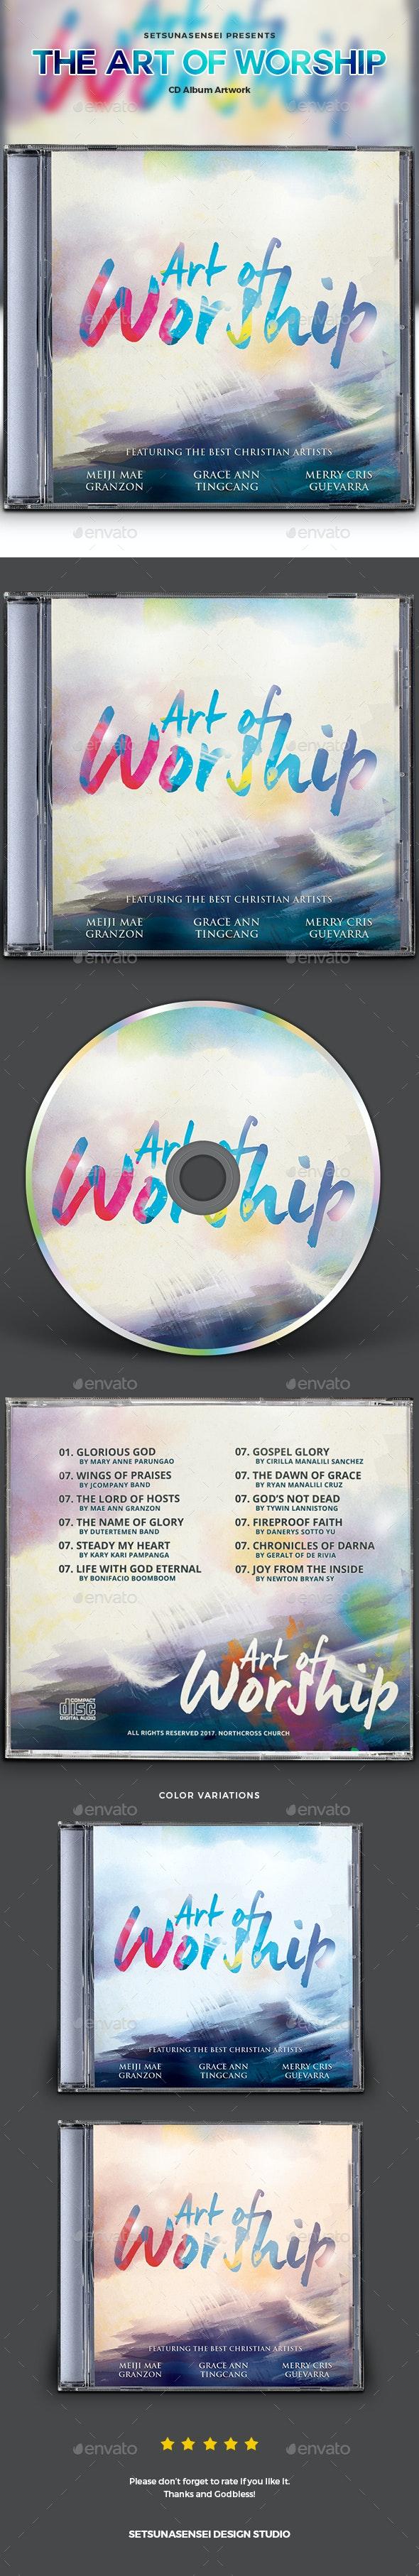 The Art of Worship CD Album Artwork - CD & DVD Artwork Print Templates